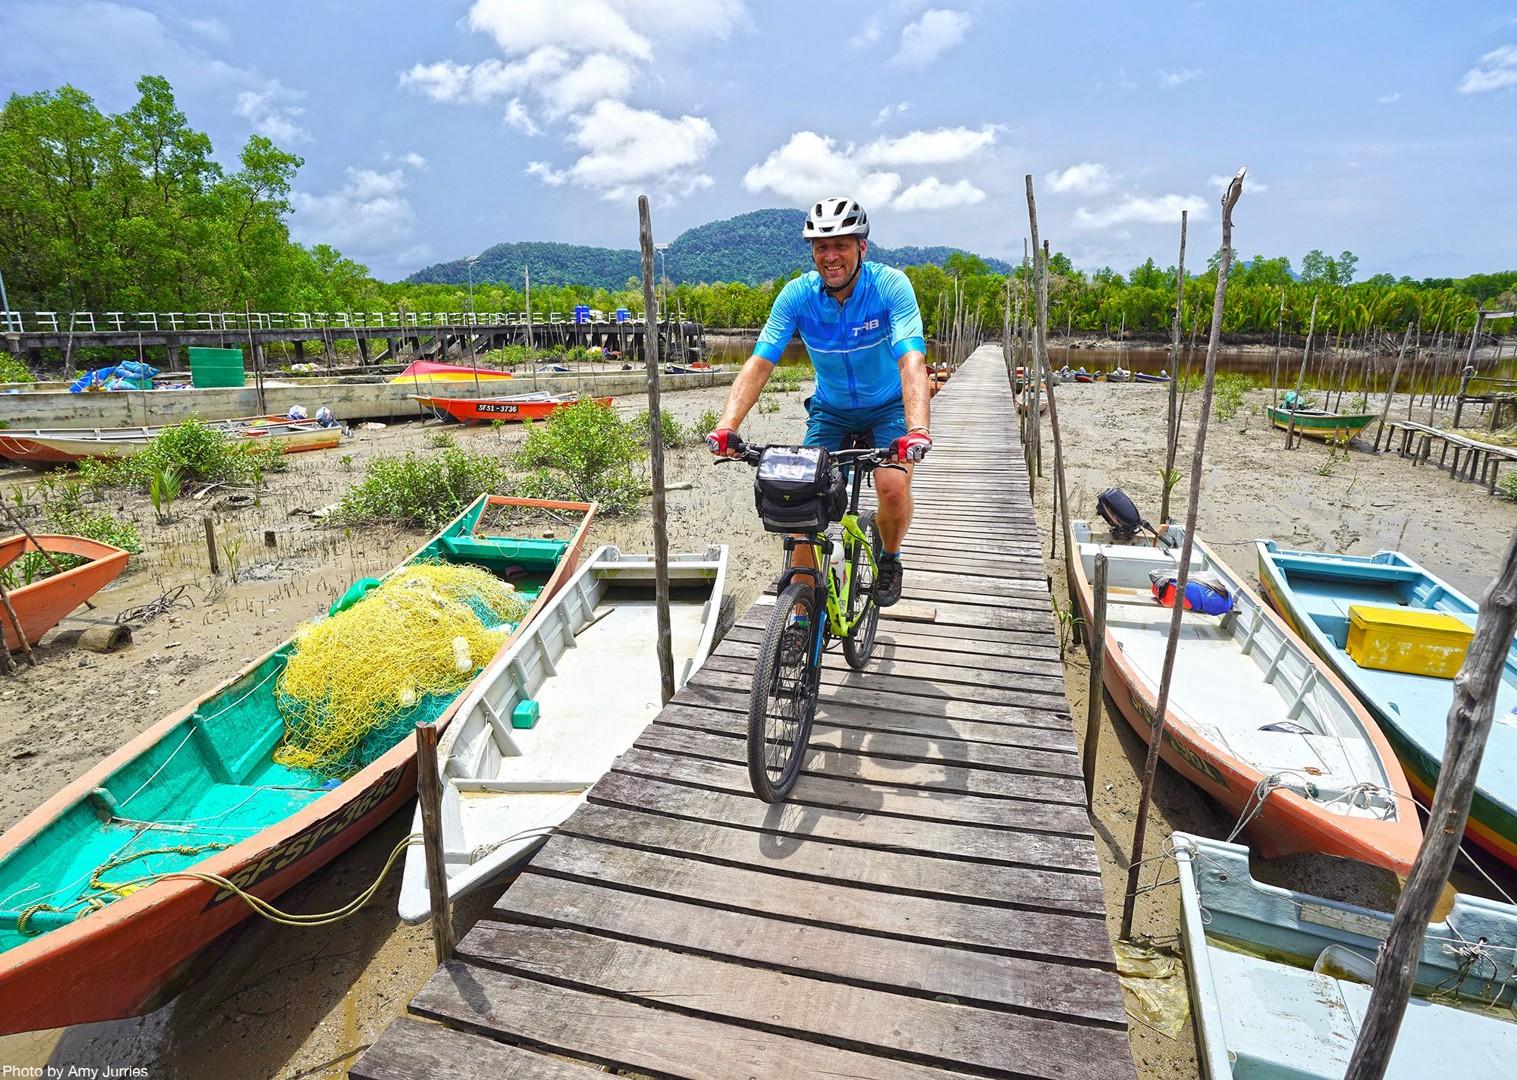 andrewboats.jpg - Borneo - Sarawak Jungle Adventures - Family Cycling